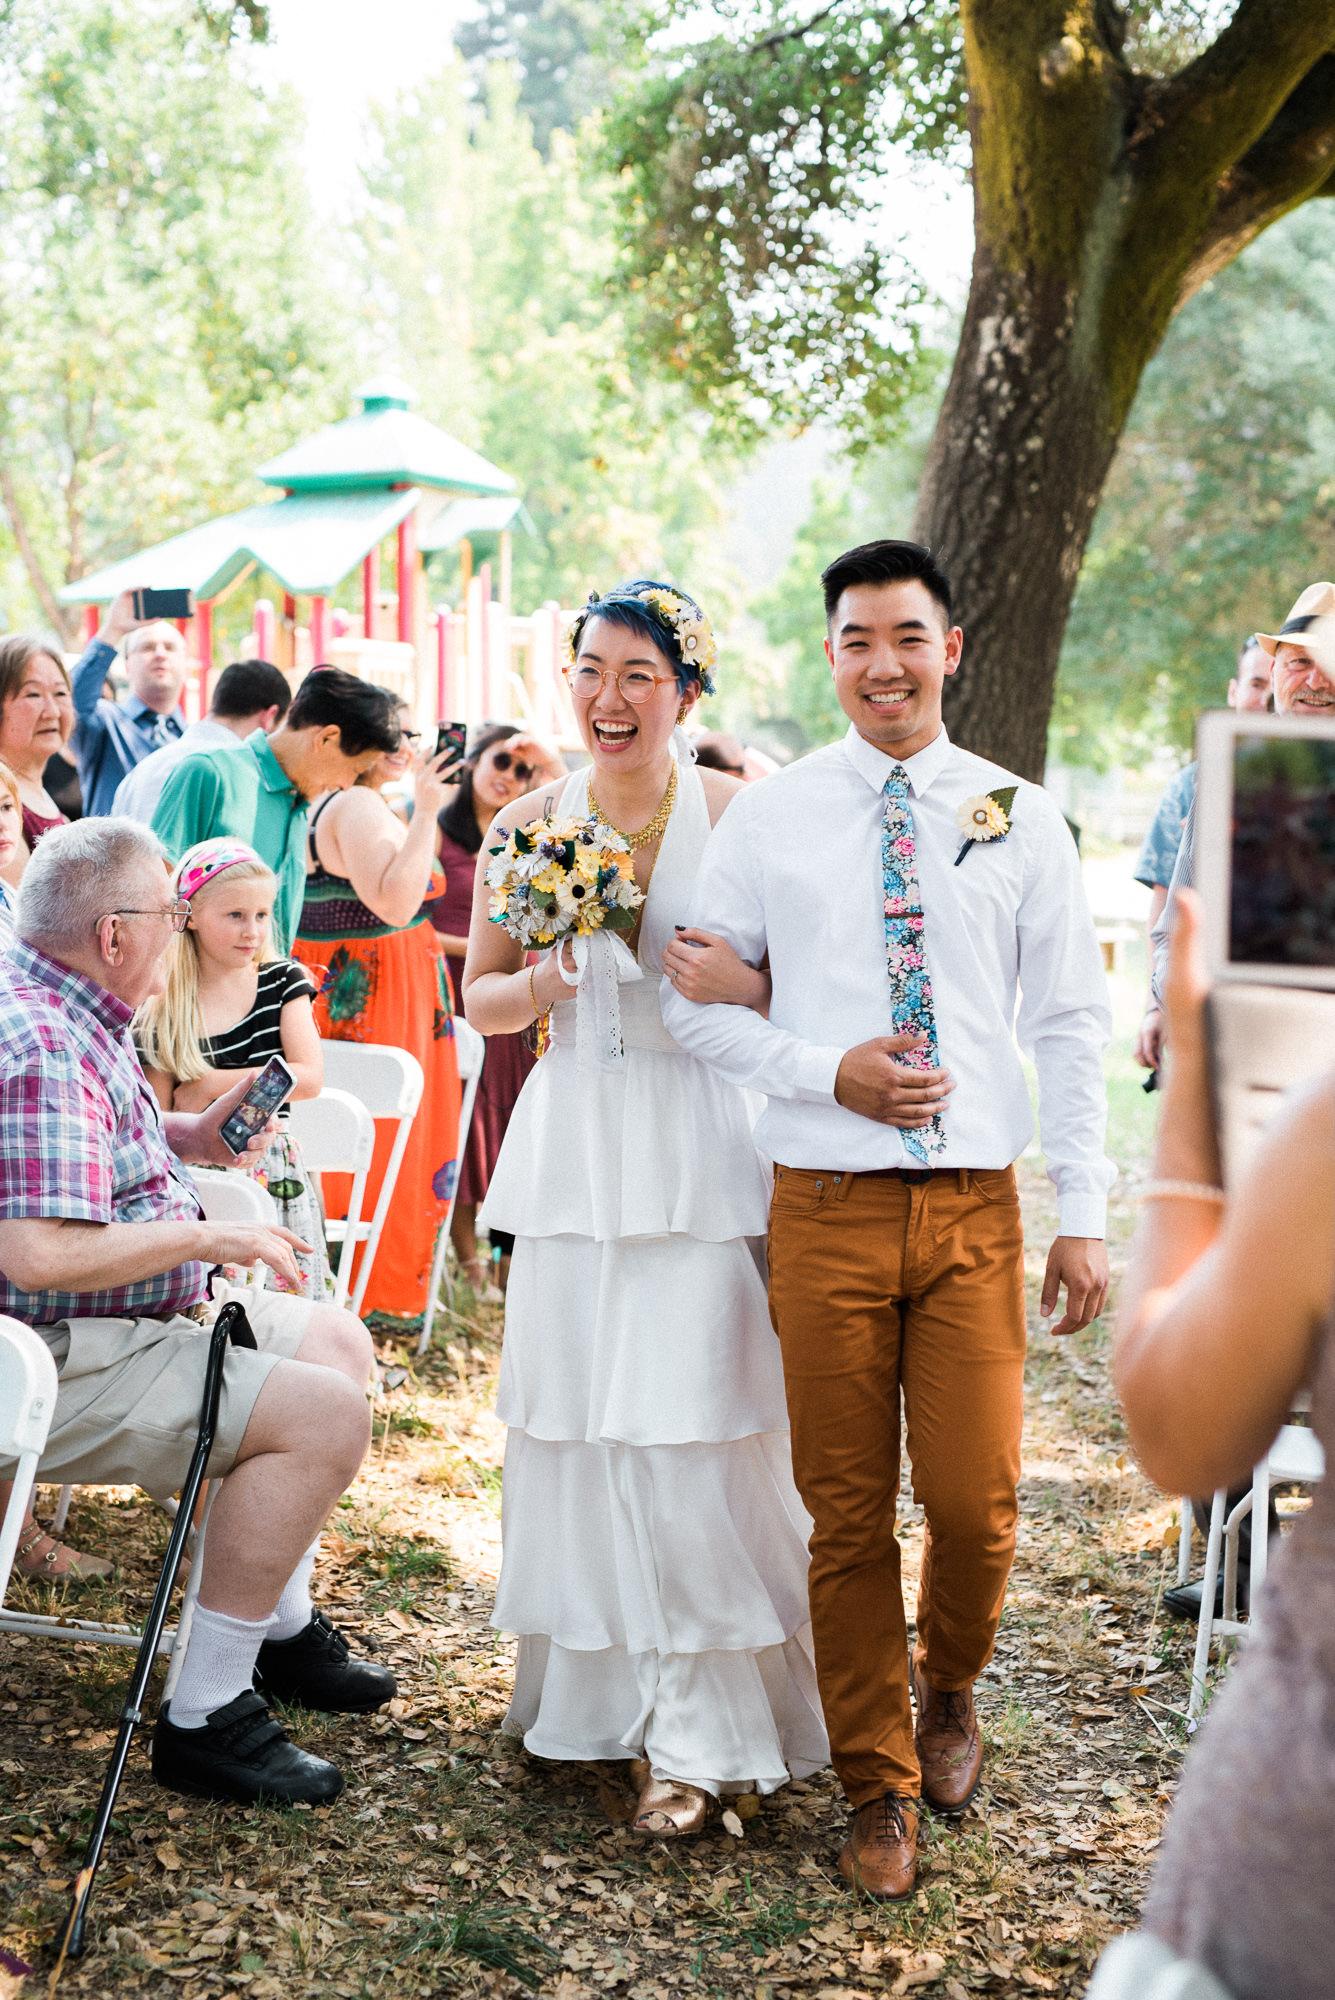 Monte Rio Community Center Wedding 030.jpg